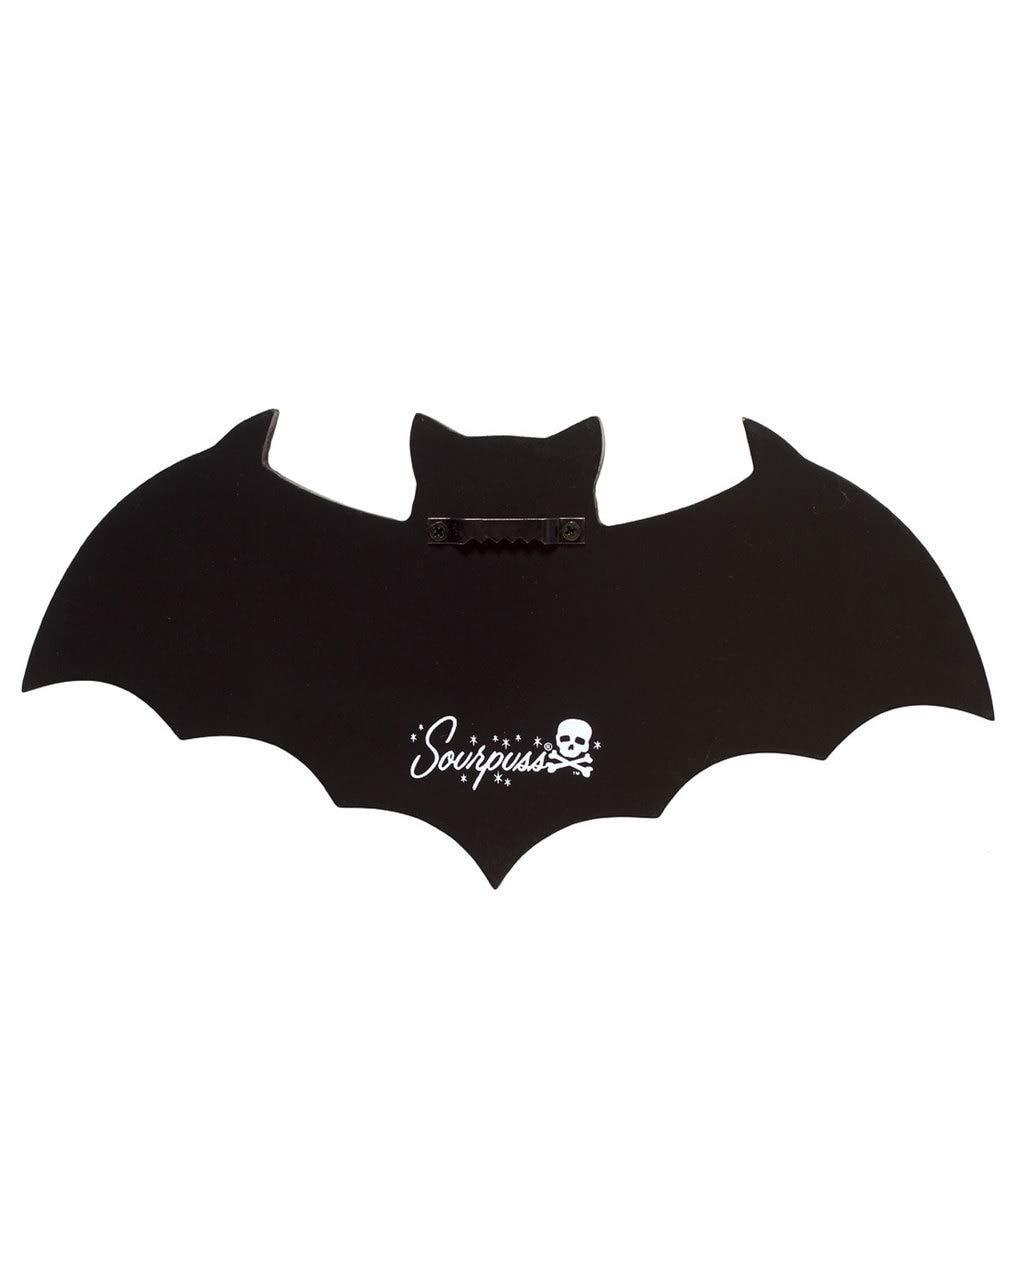 Sourpuss Batty Key Holder